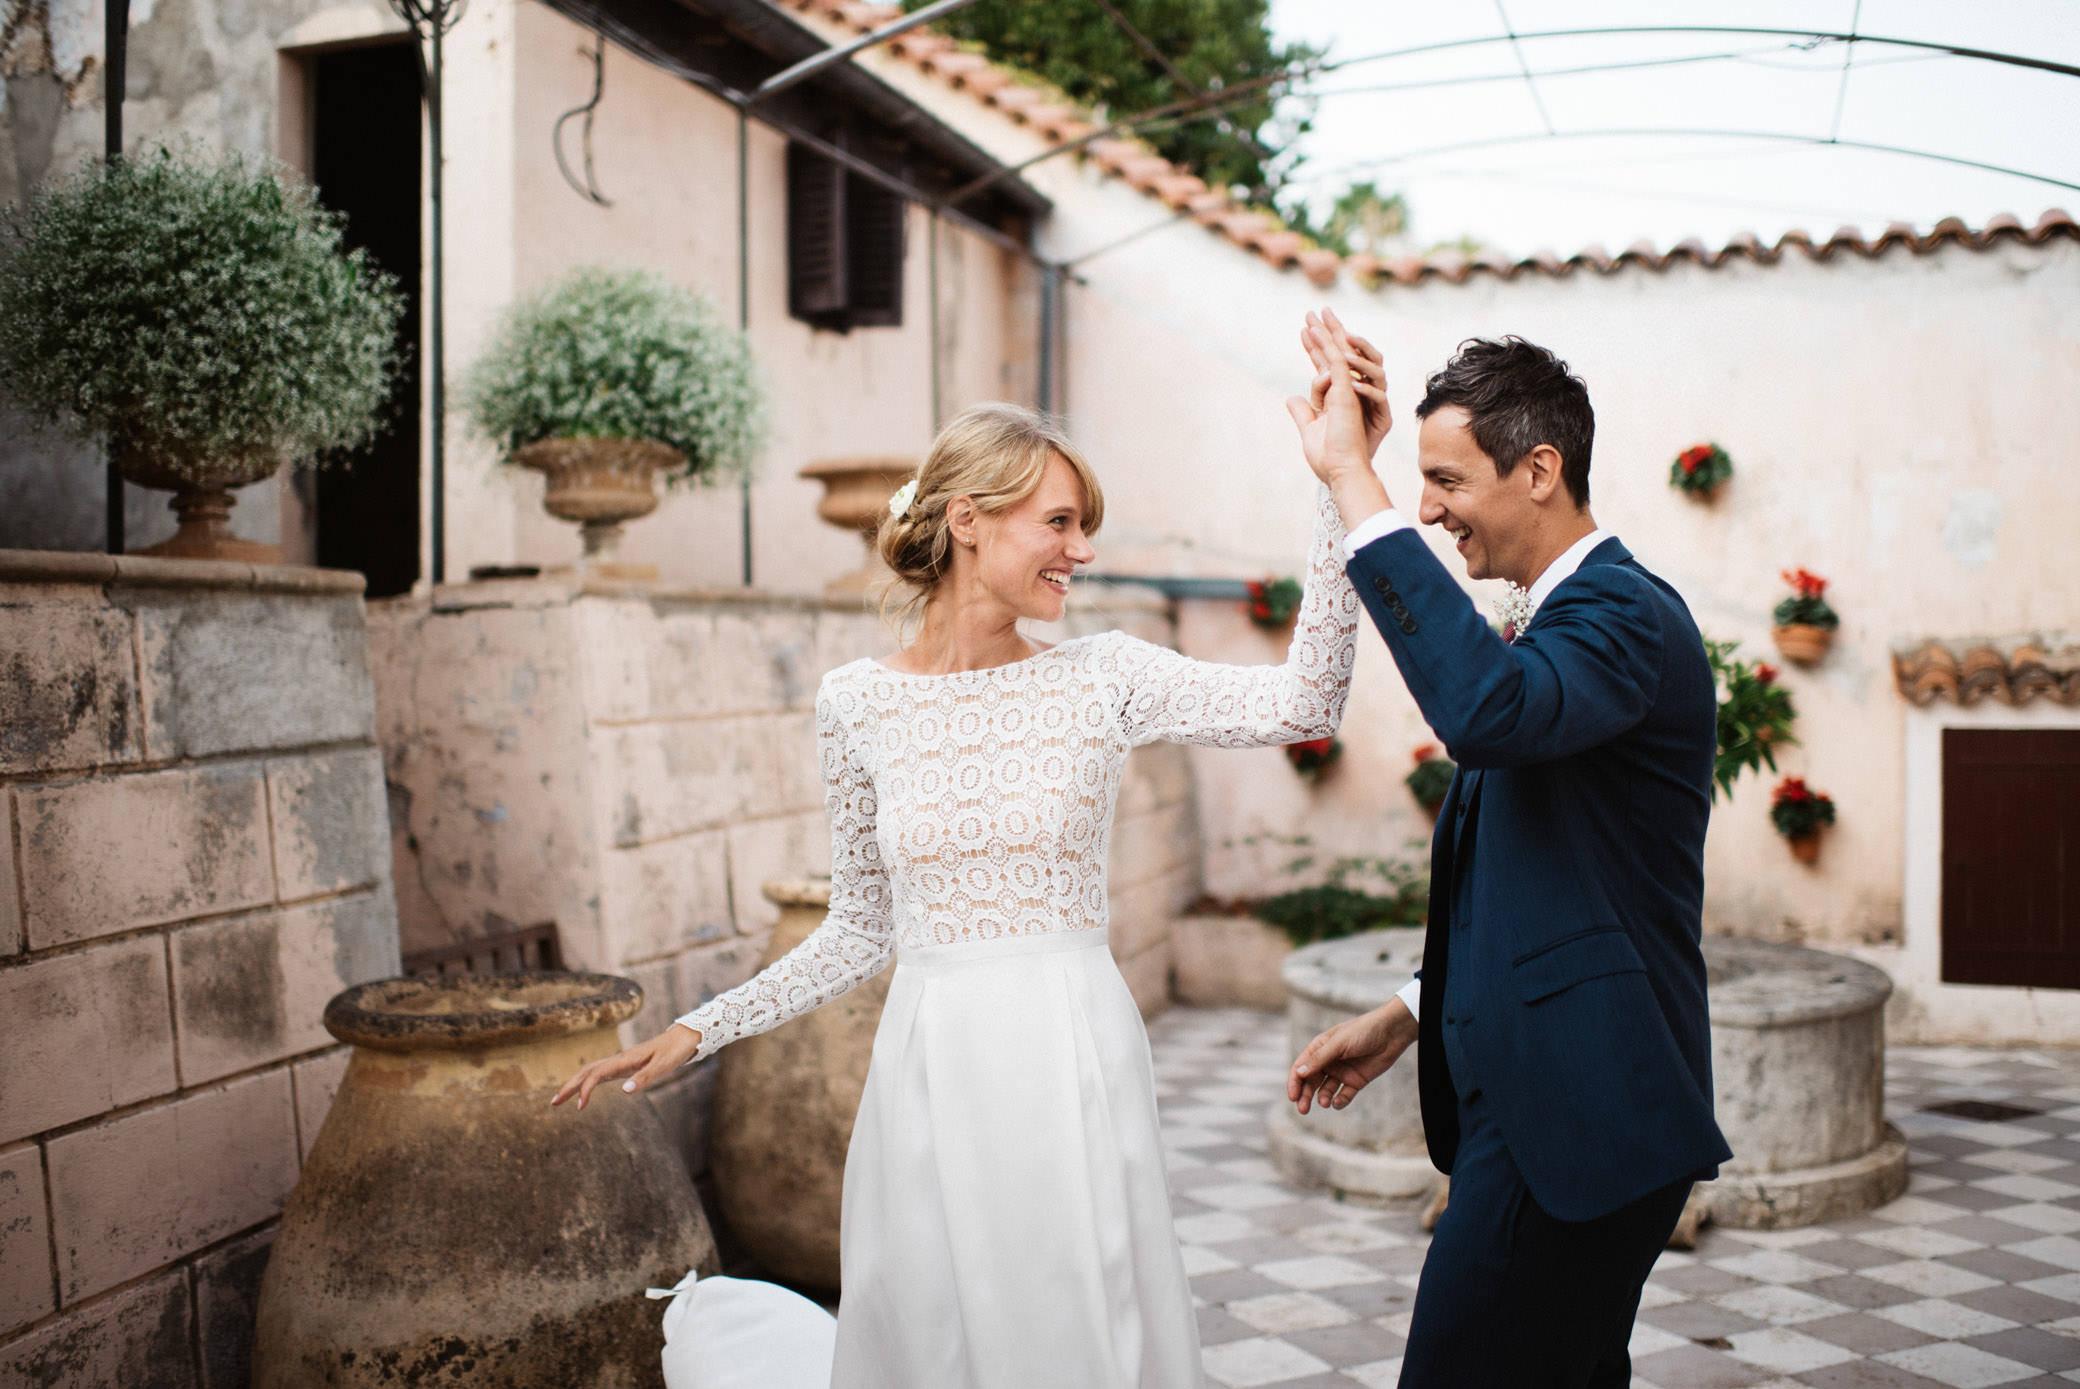 mariage-antibes-vallauris-juan-les-pins